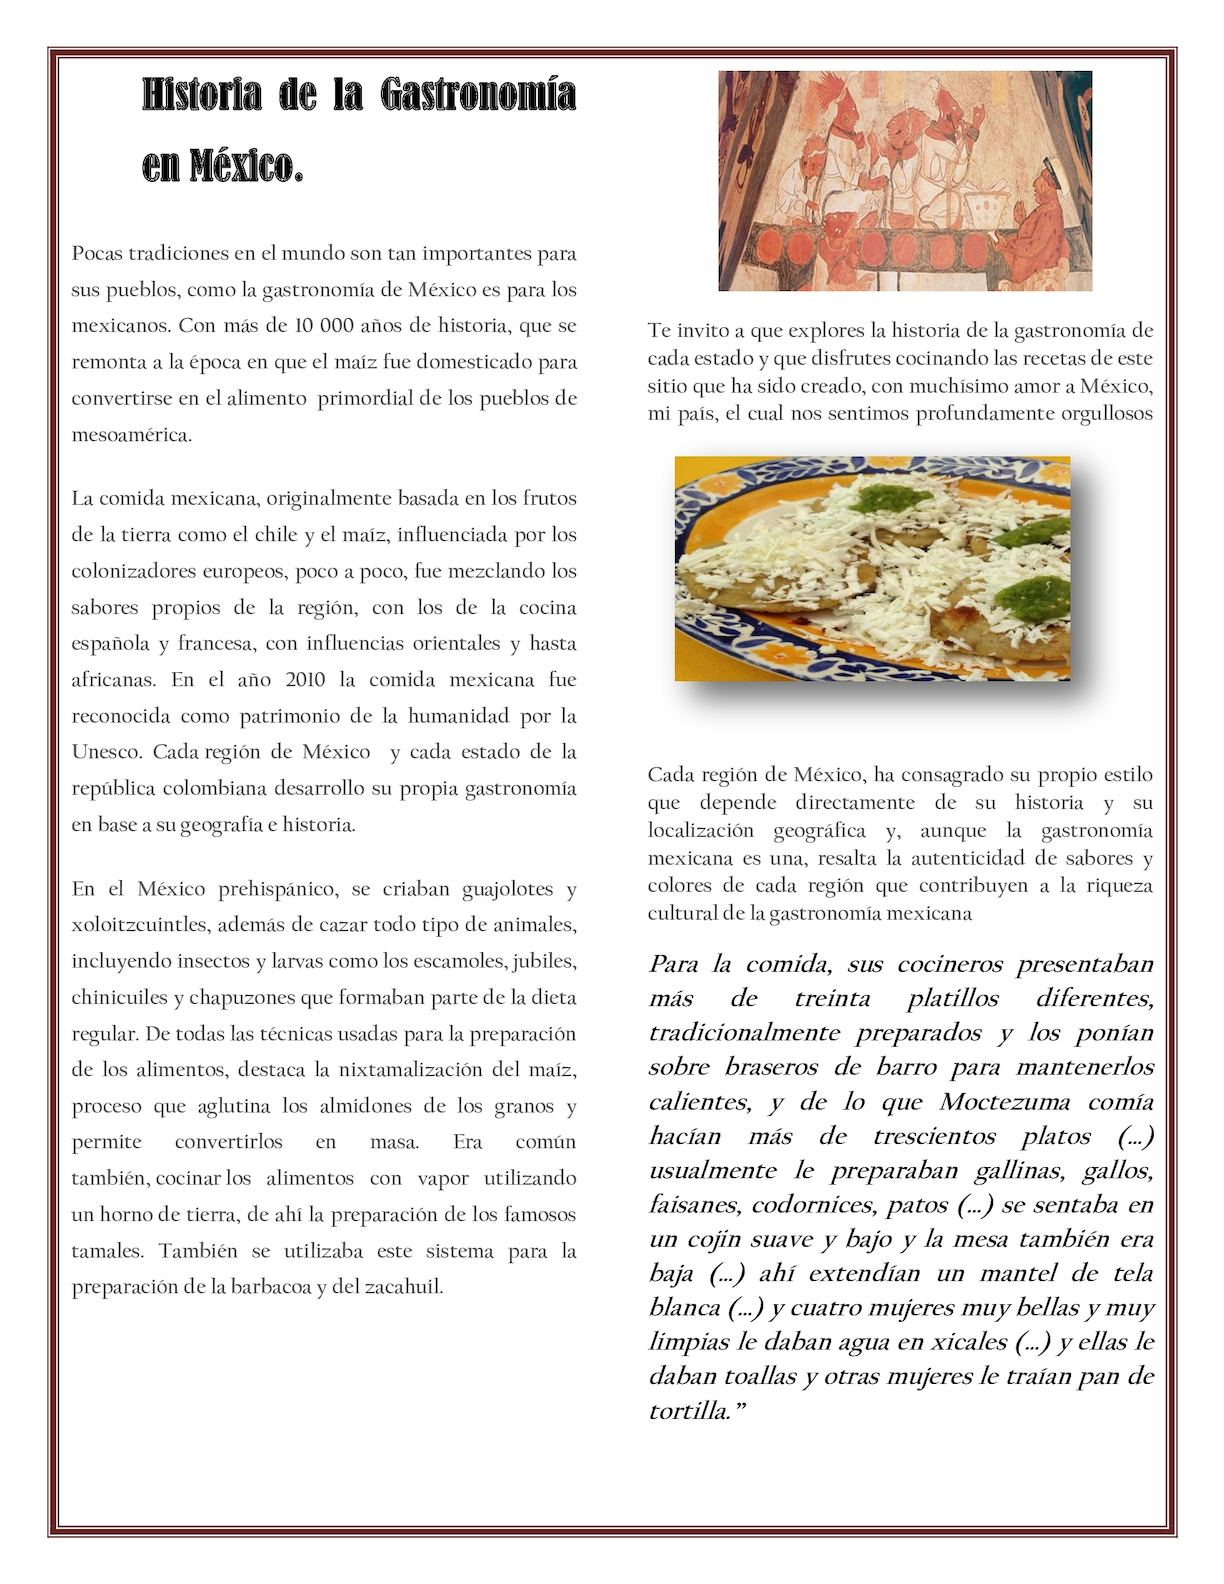 Calam o historia de la gastronom a en m xico for Caracteristicas de la gastronomia francesa